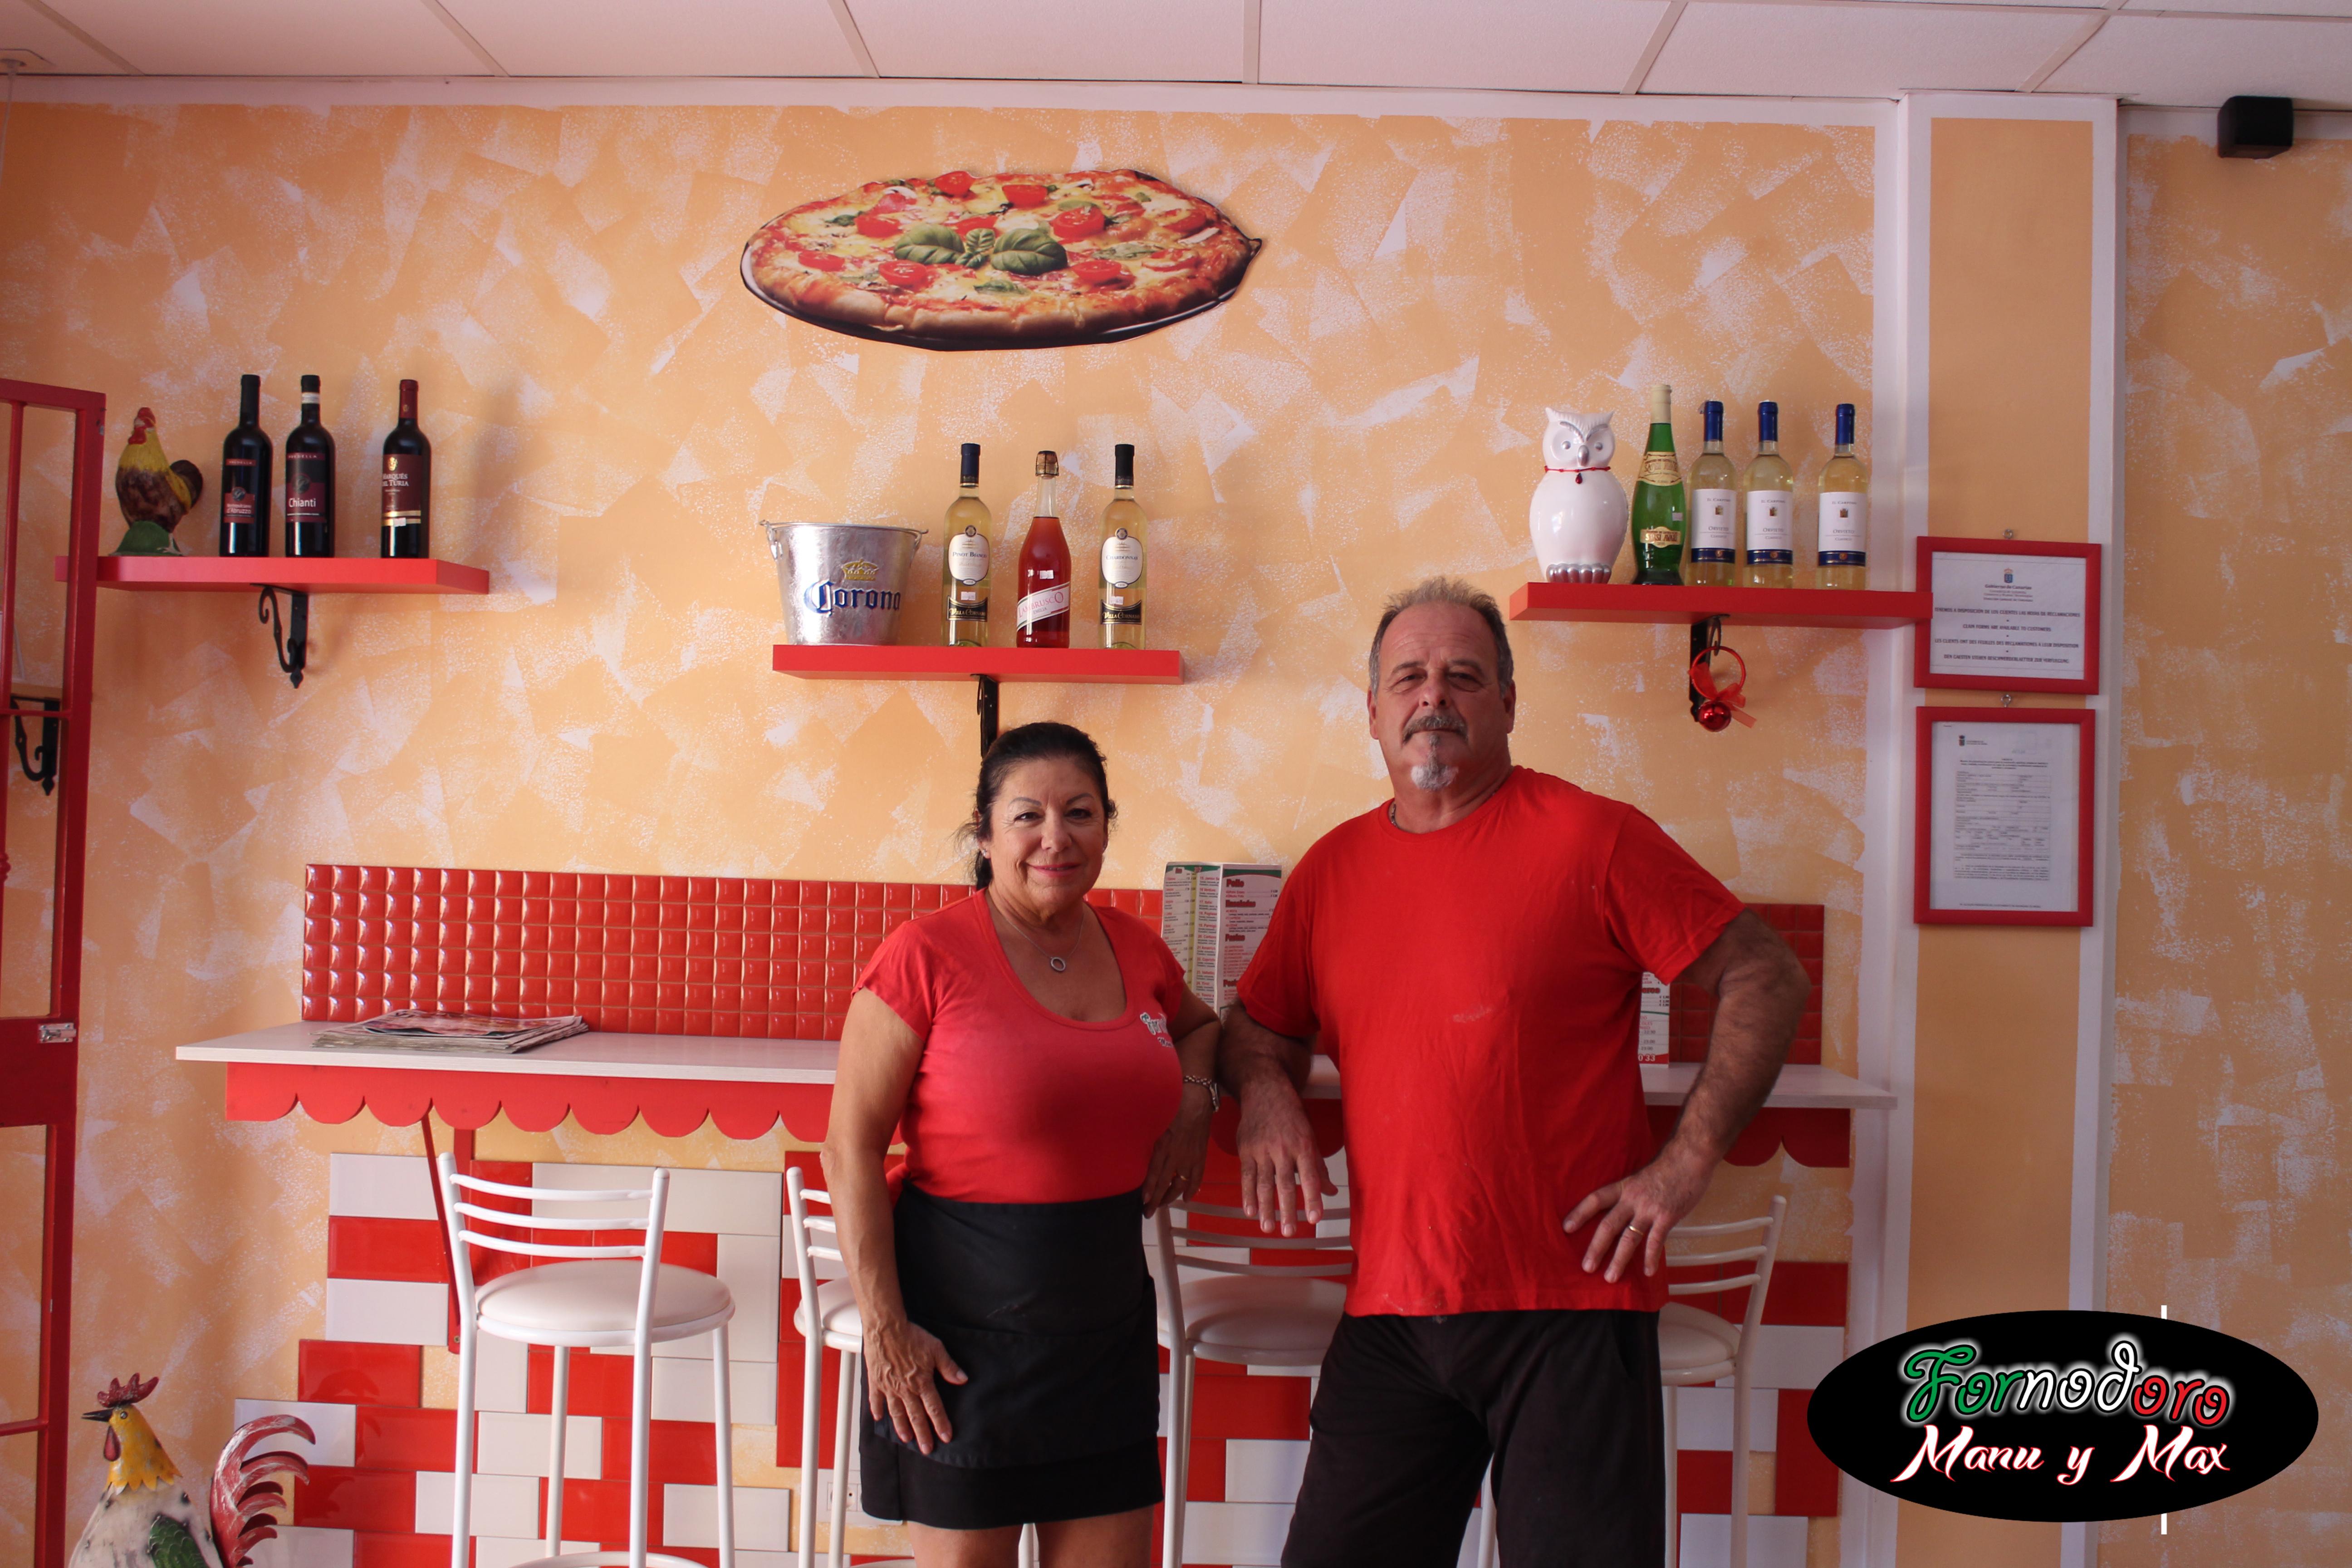 pizzeria en las chafiras fornodoro